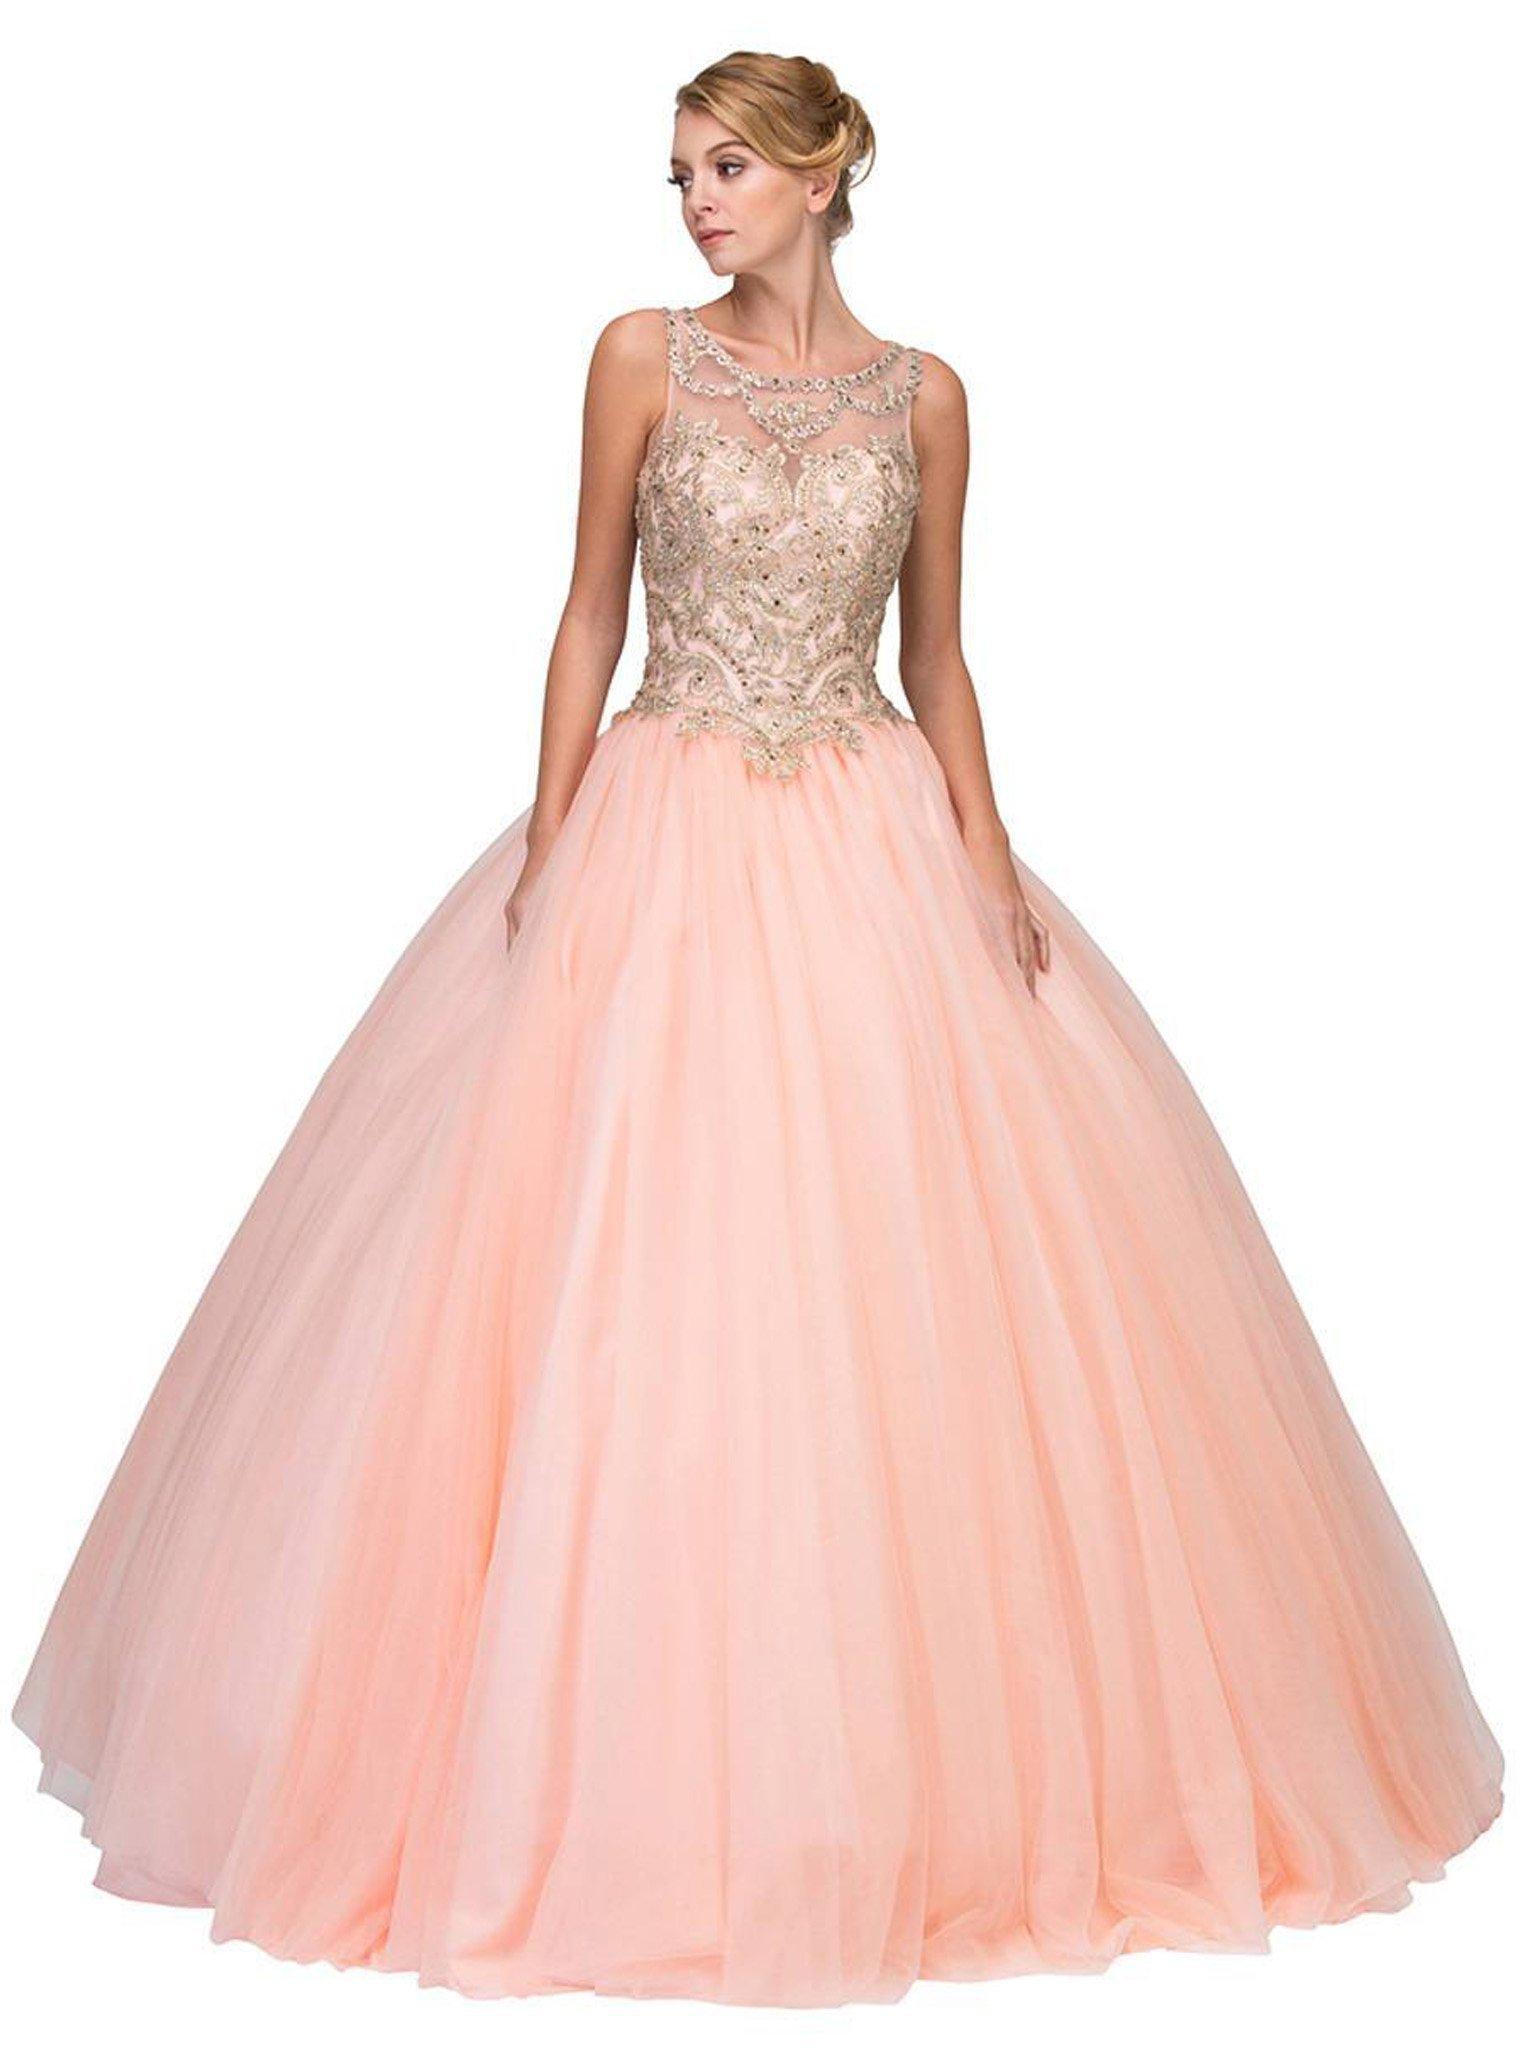 Eureka Fashion - Gilded Bateau Neck Mesh Ball Gown